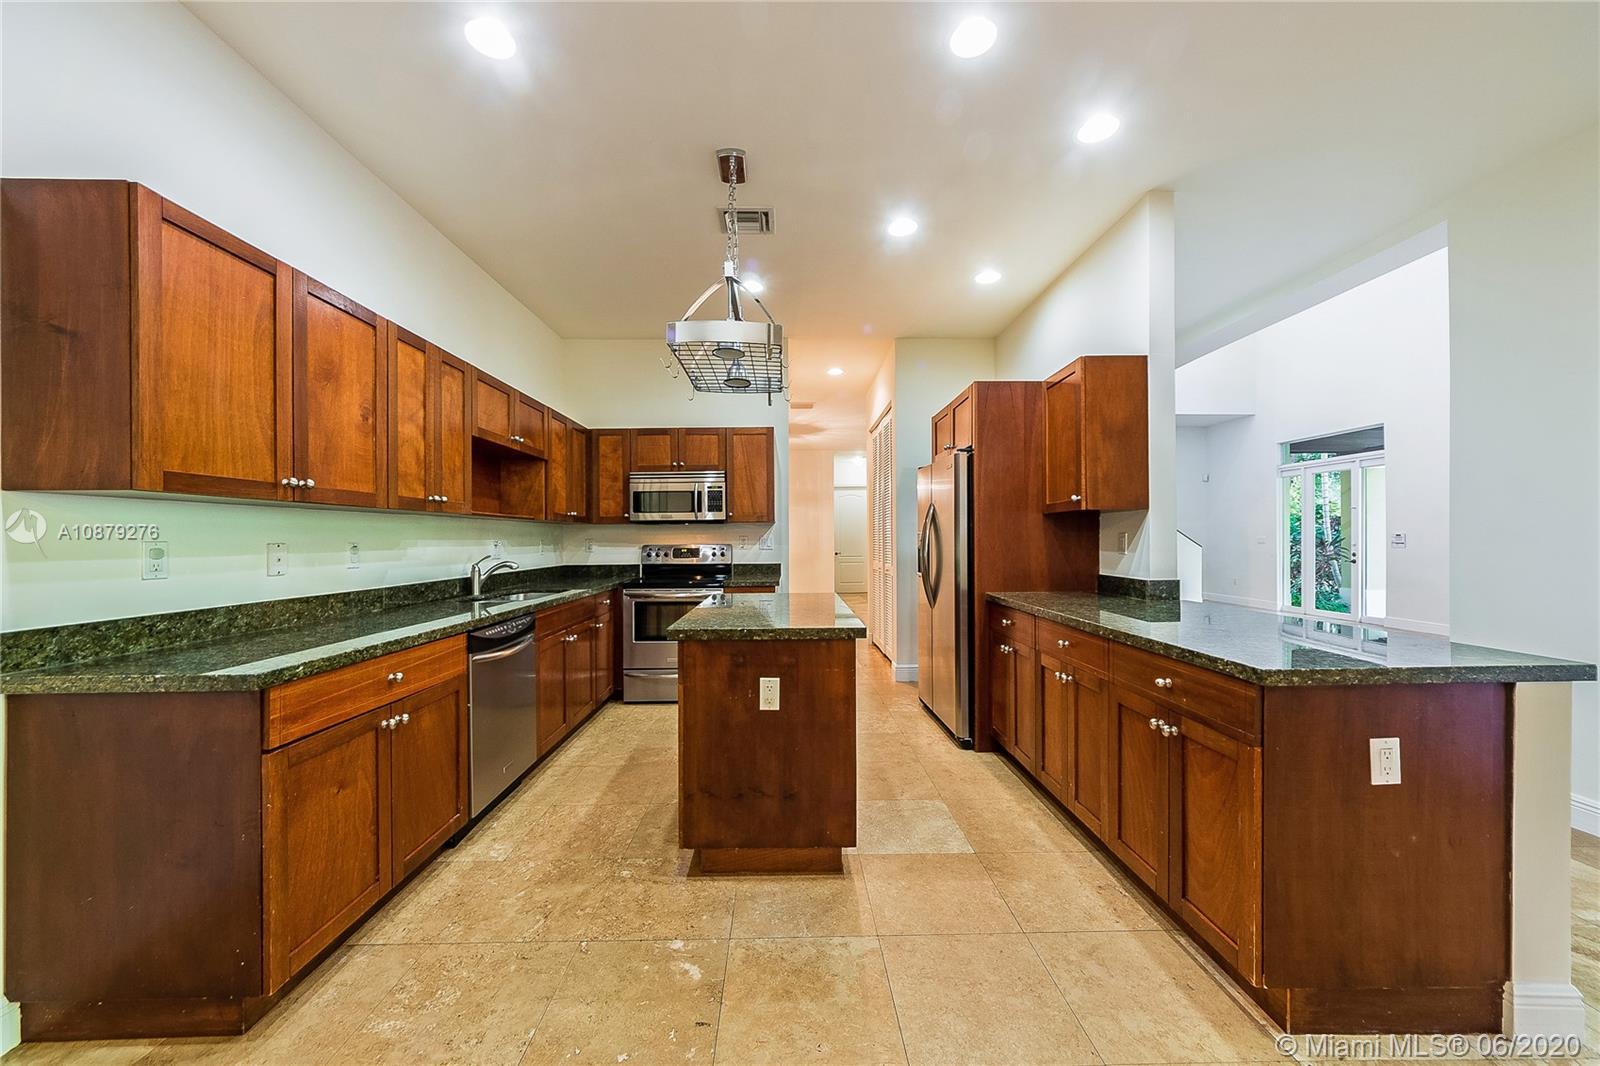 Photo - 9550 SW 73rd Ave # 9550, Pinecrest FL 33156